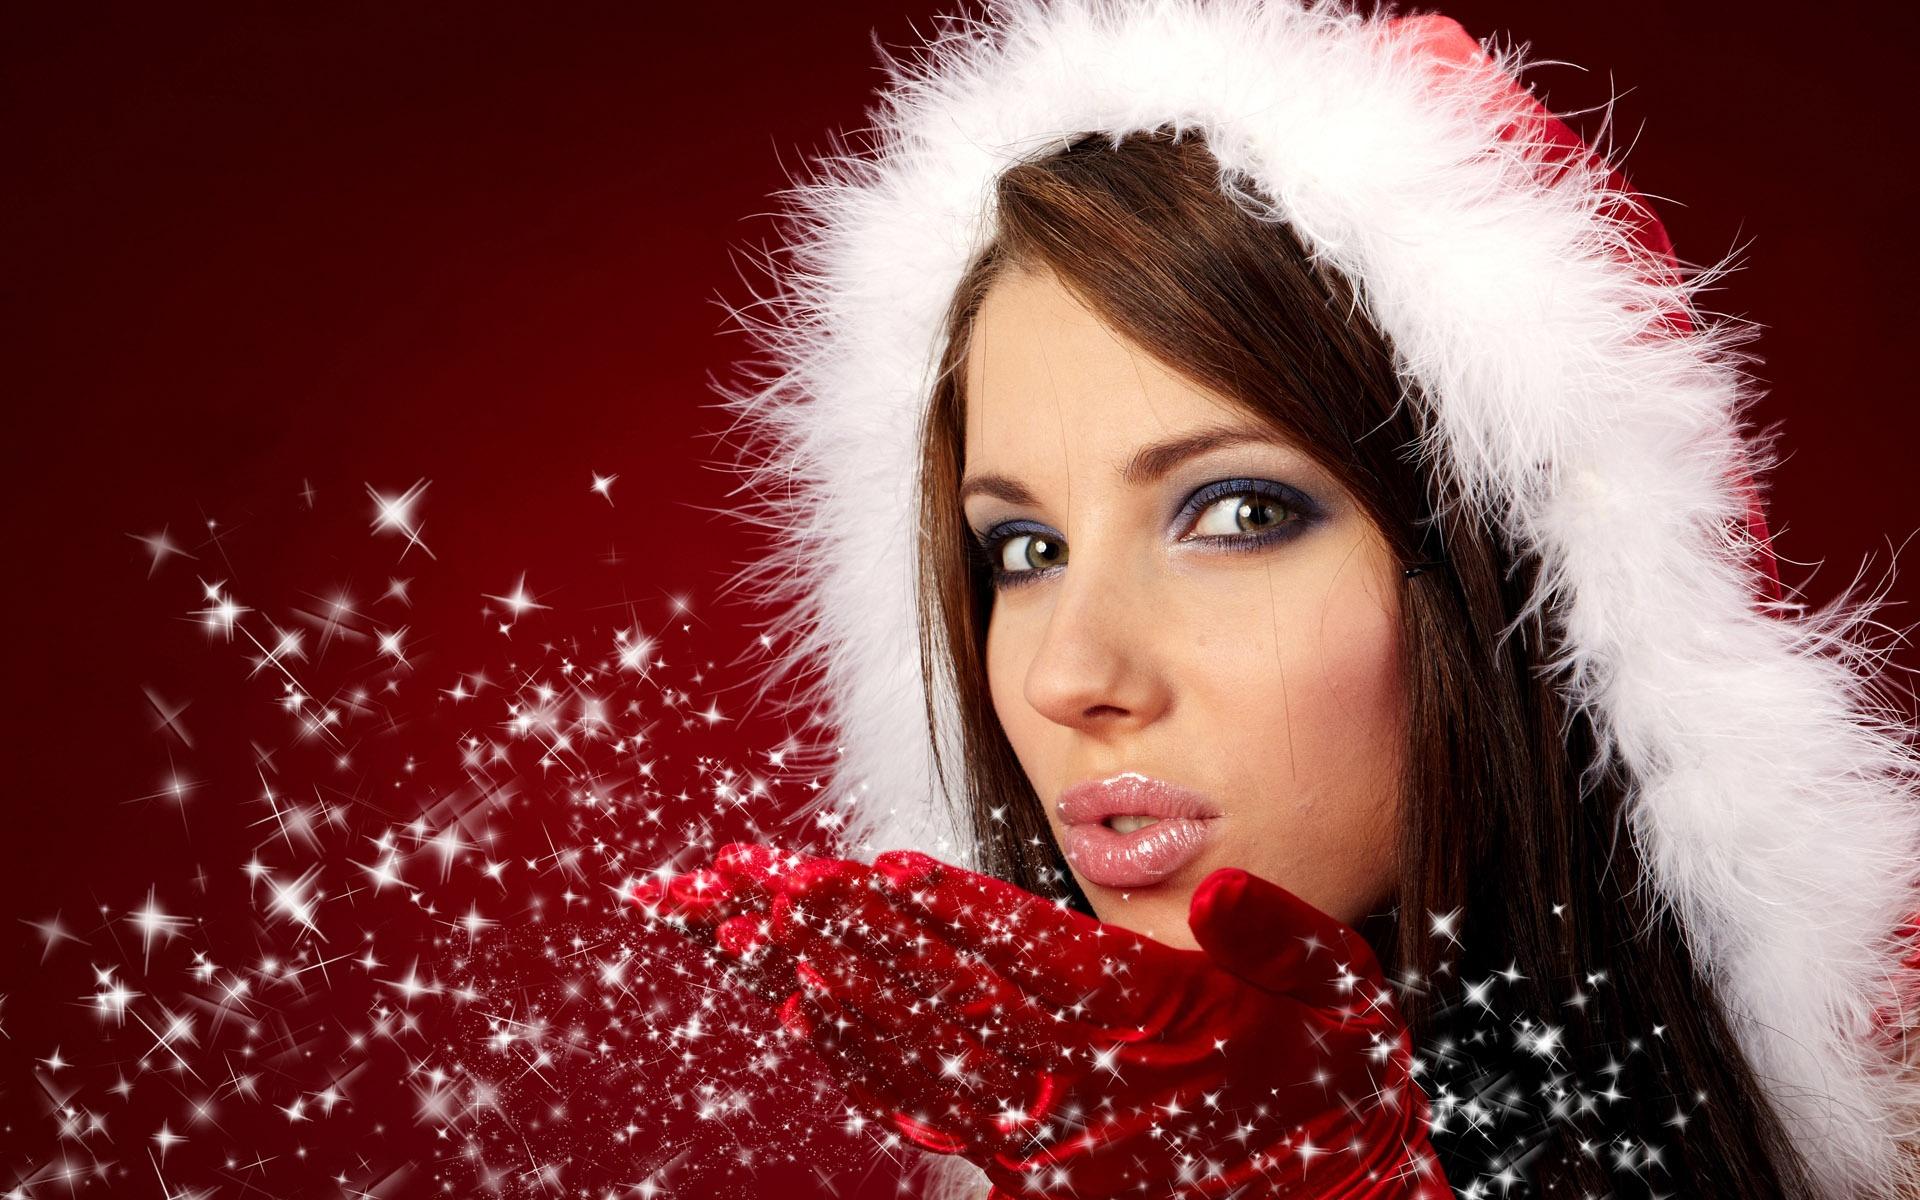 Christmas Girl wallpaper